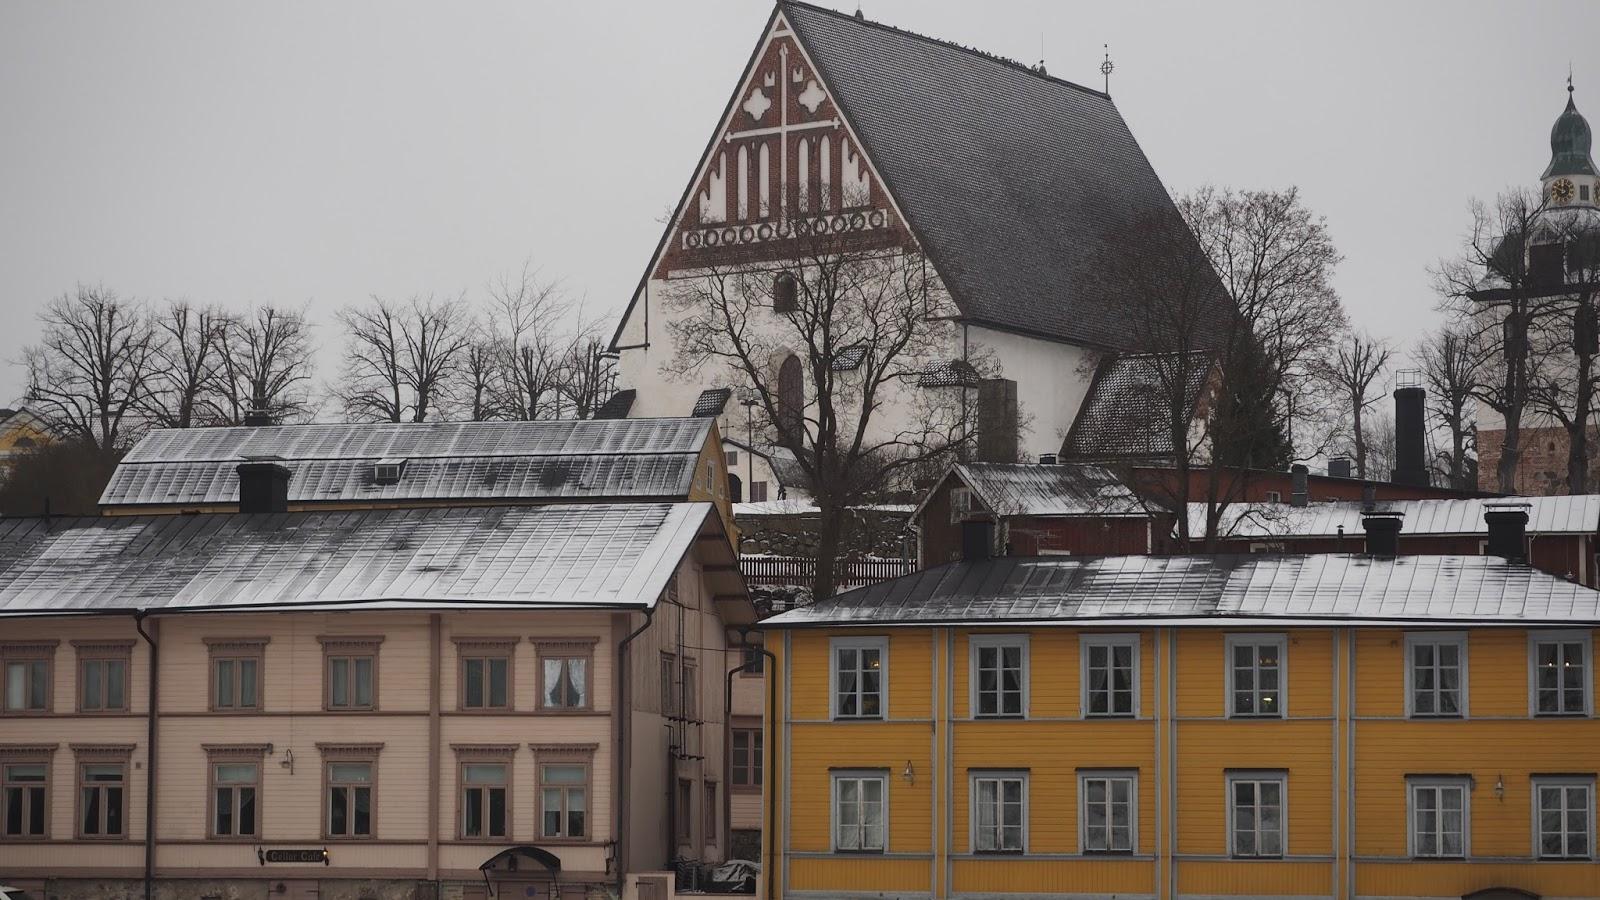 vanha porvoon kaupunki